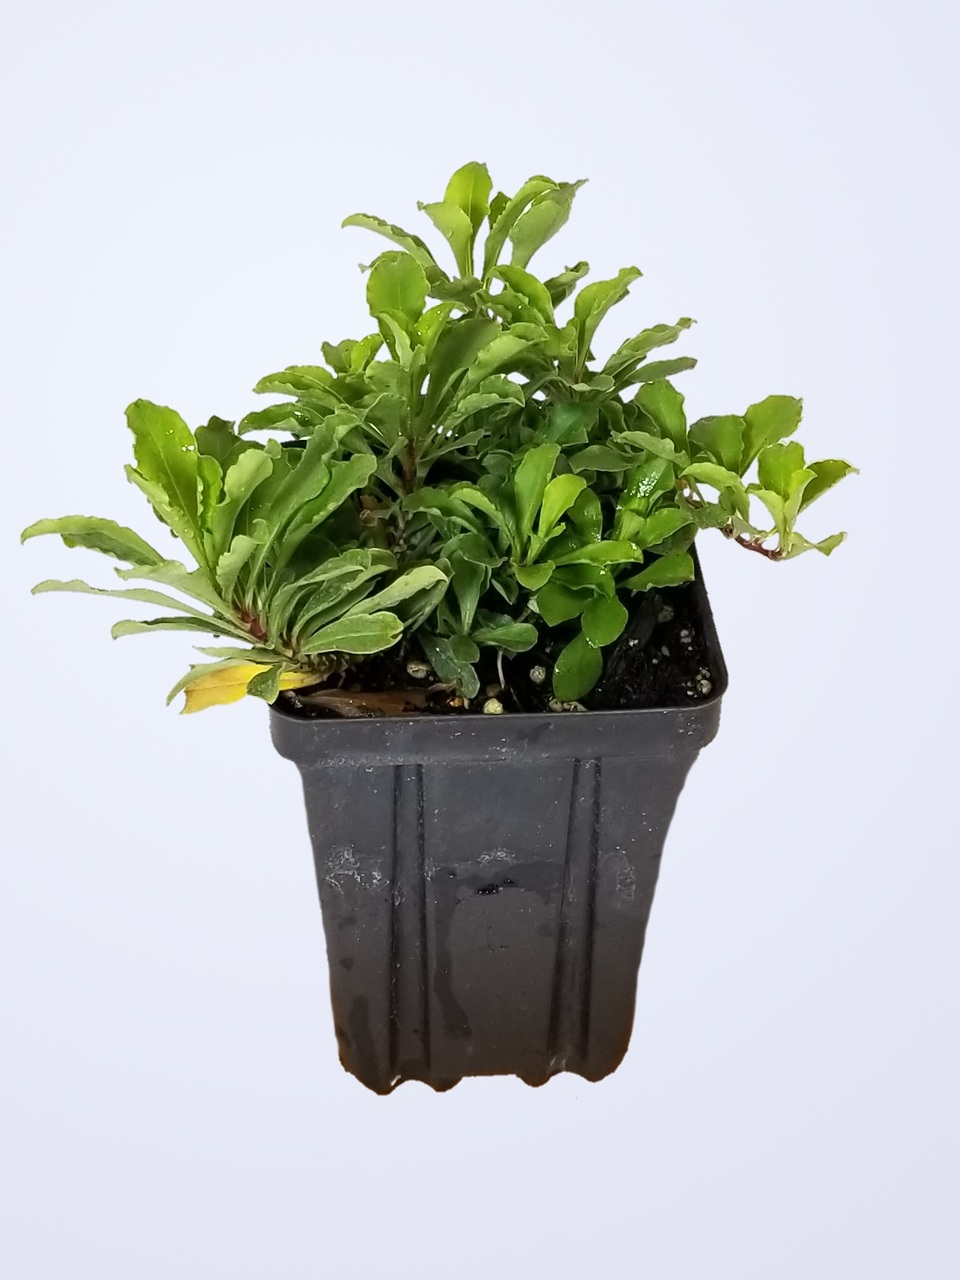 Phlox stolonifera 'Sherwood Purple' - Creeping Phlox 1-year old Quart Pot Potted Plant